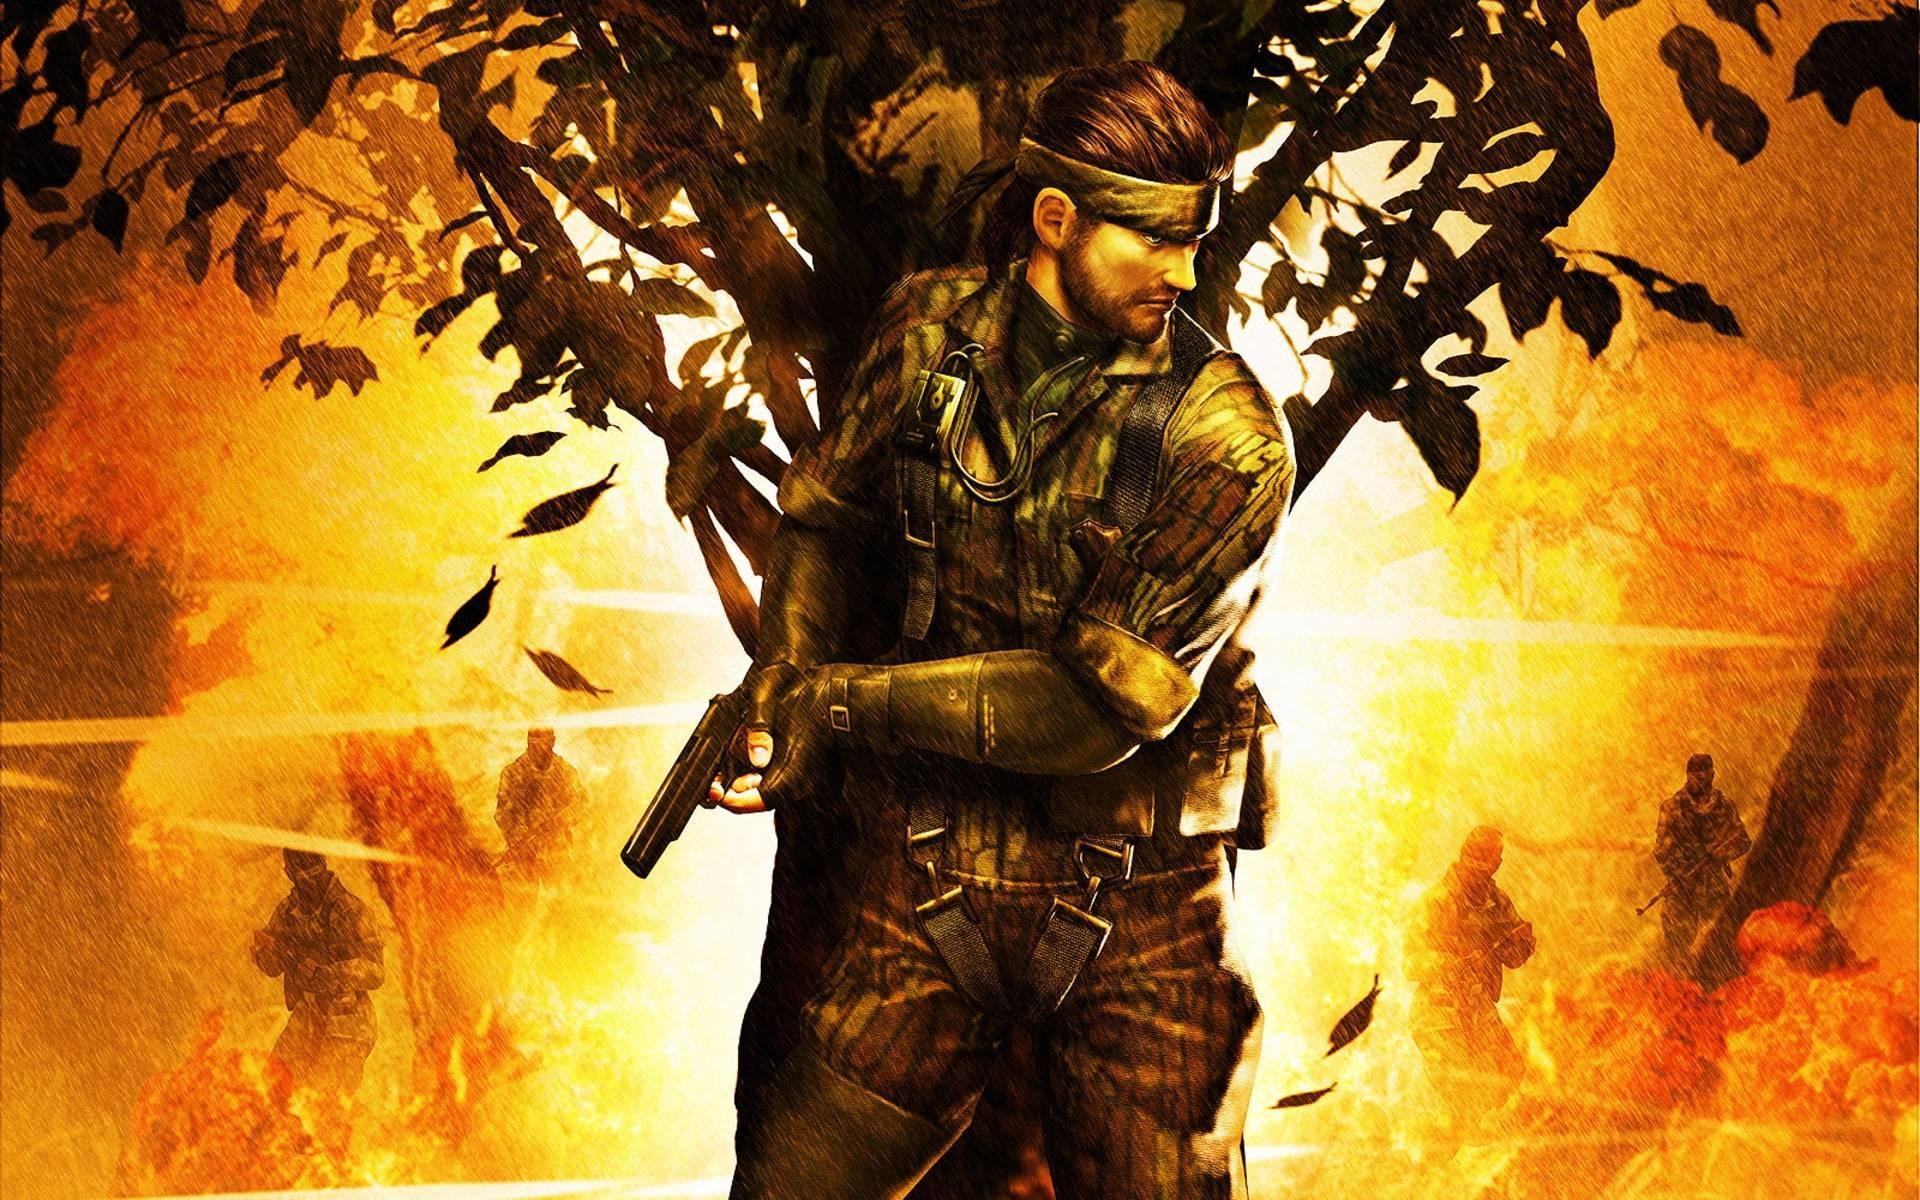 Metal Gear Solid 3 Wallpapers – Full HD wallpaper search